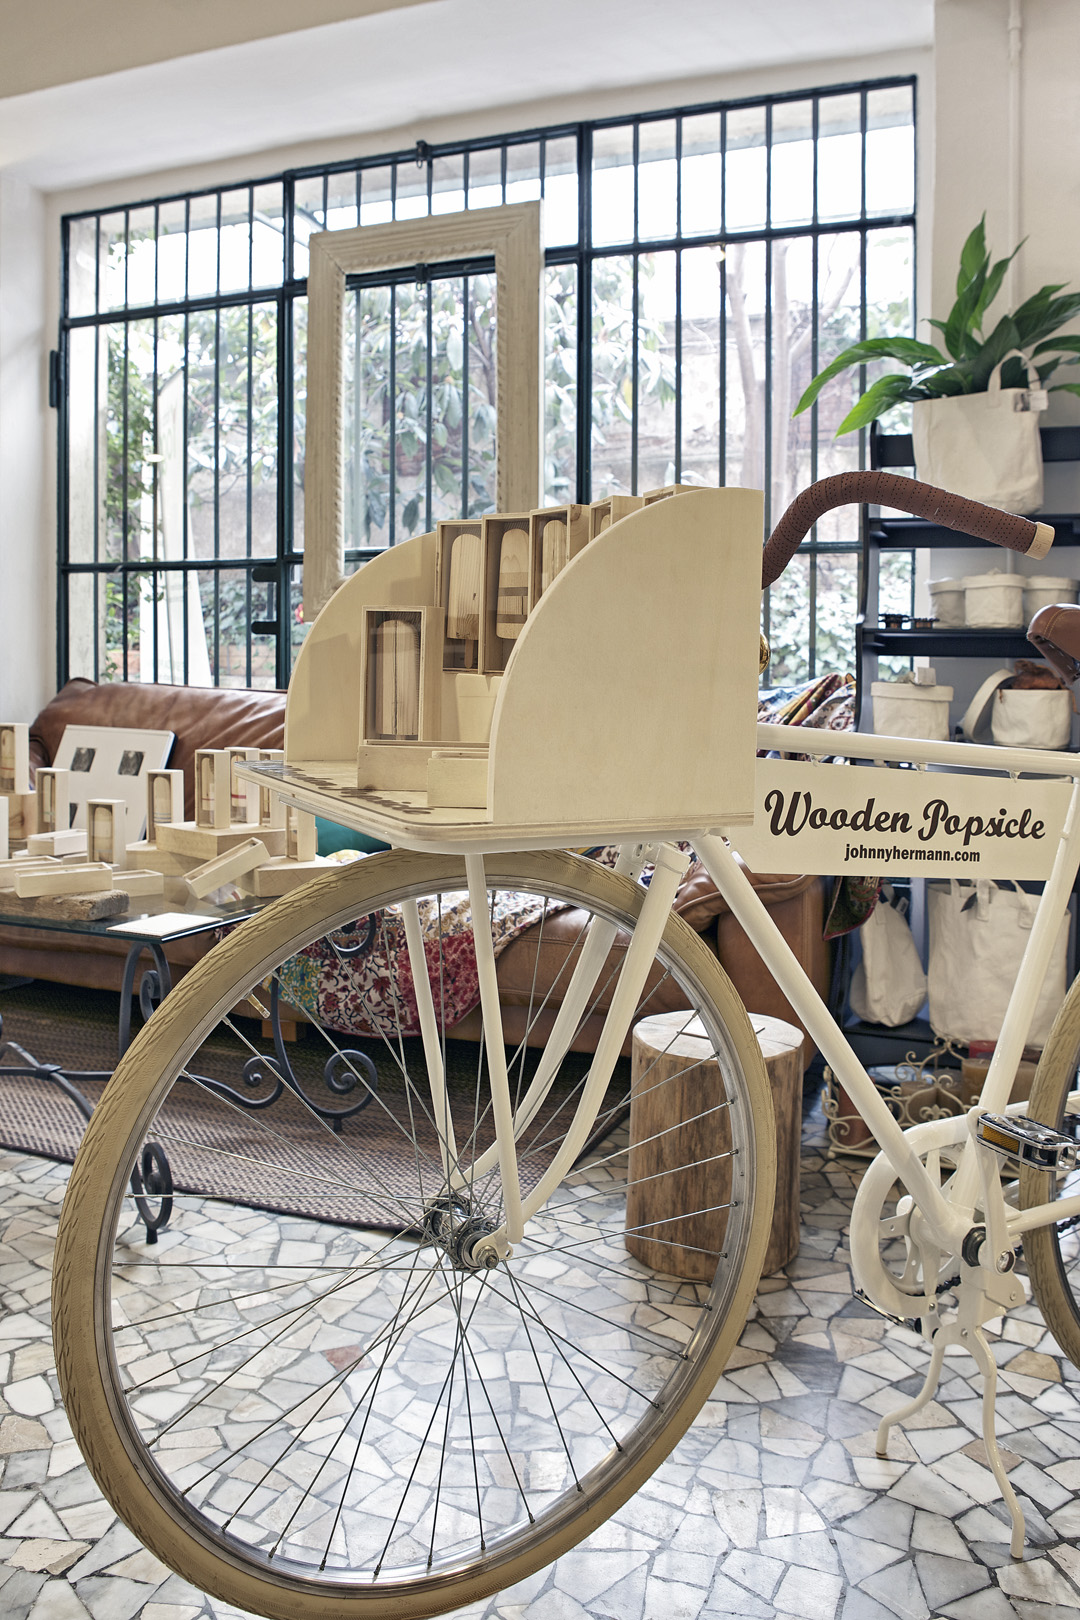 https://www.pasqualeformisano.com/wp-content/uploads/2016/11/wooden_popsicle_05.jpg